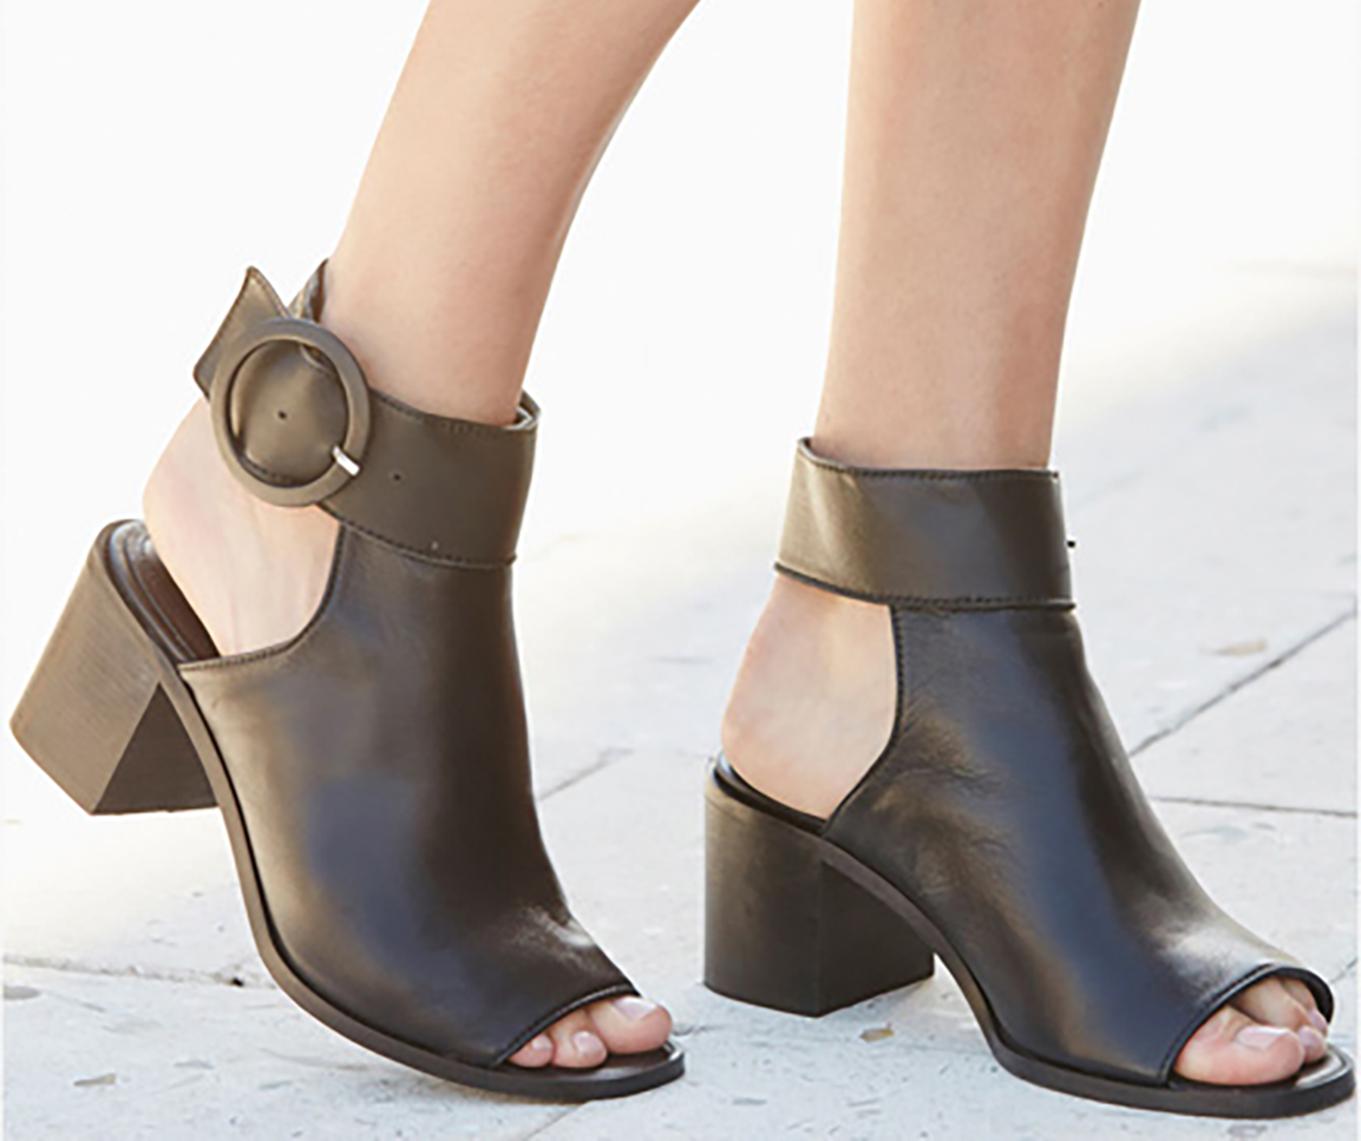 Next-Black-Leather-Buckle-Shoe-Boots-9106-0543453-1-pdp_slider_l